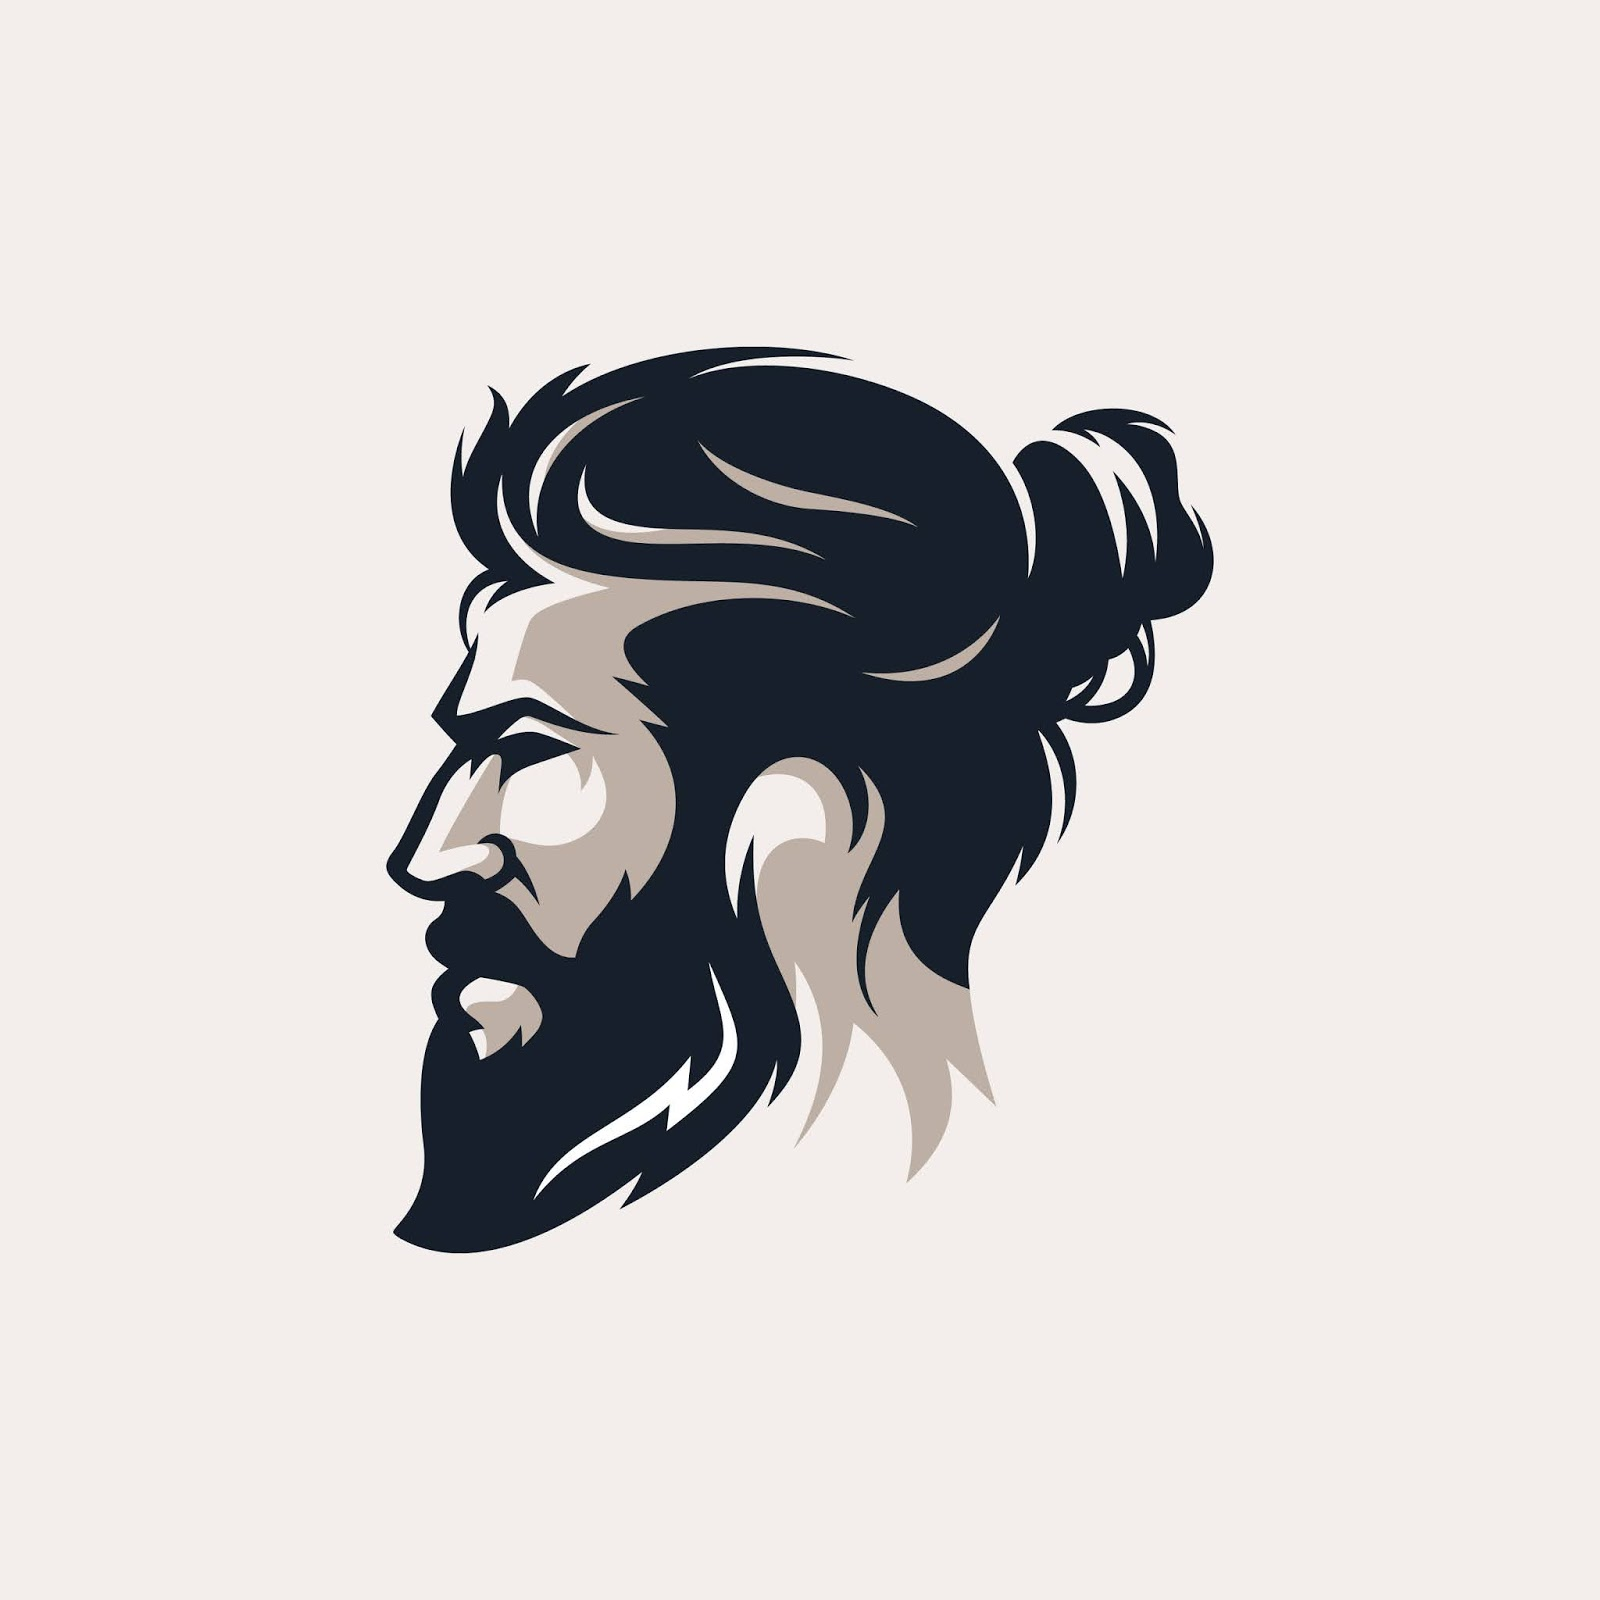 Beard Man Barber Shop Logo Vector Illustration Free Download Vector CDR, AI, EPS and PNG Formats